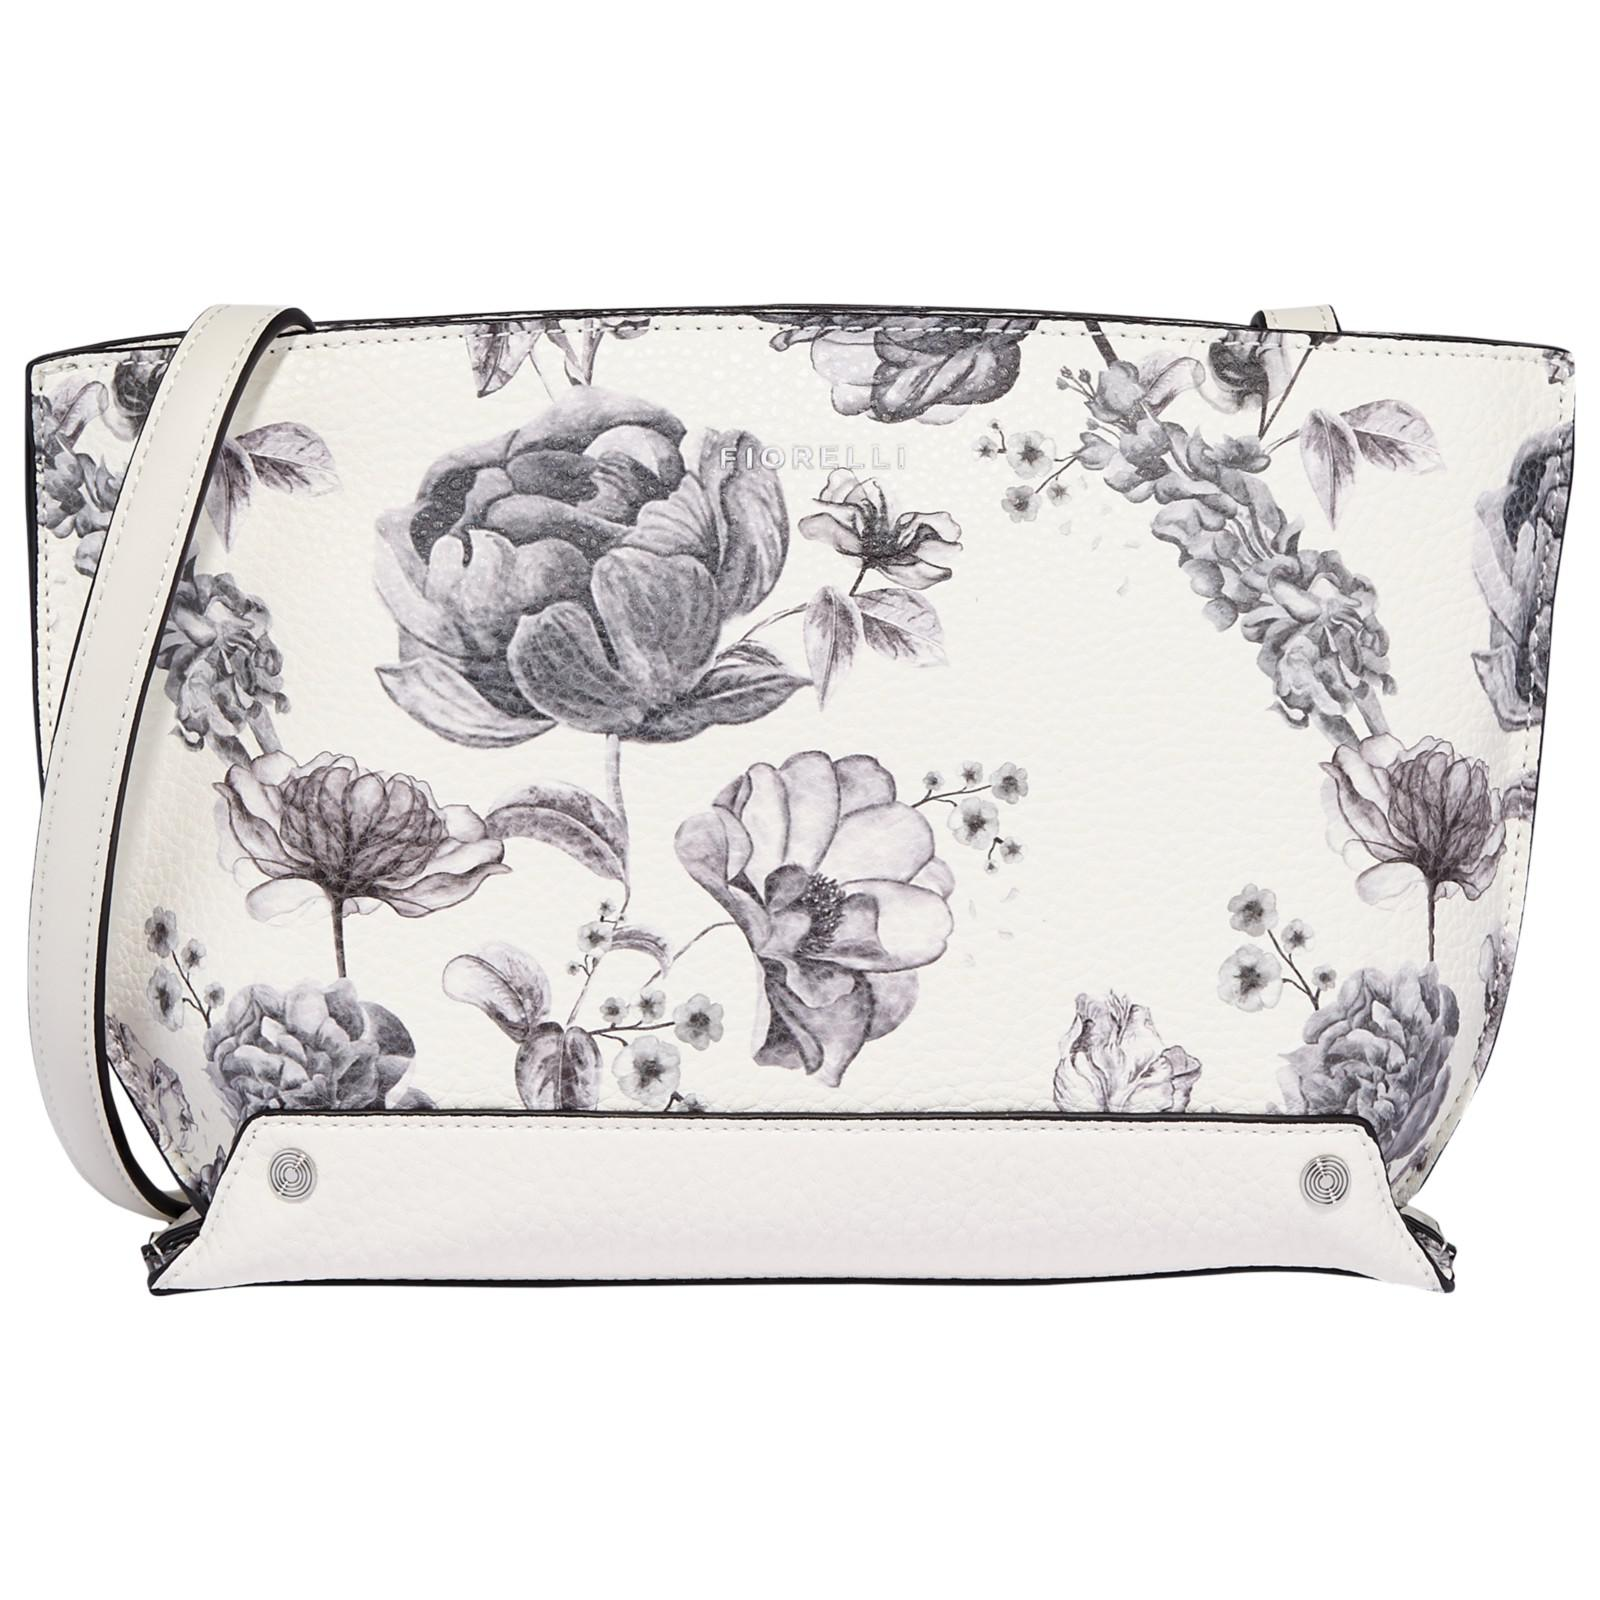 Fiorelli Womens Hampton Cross-Body Bag (MONO BOTANICAL) Discount Nicekicks 4RaJboQfR4